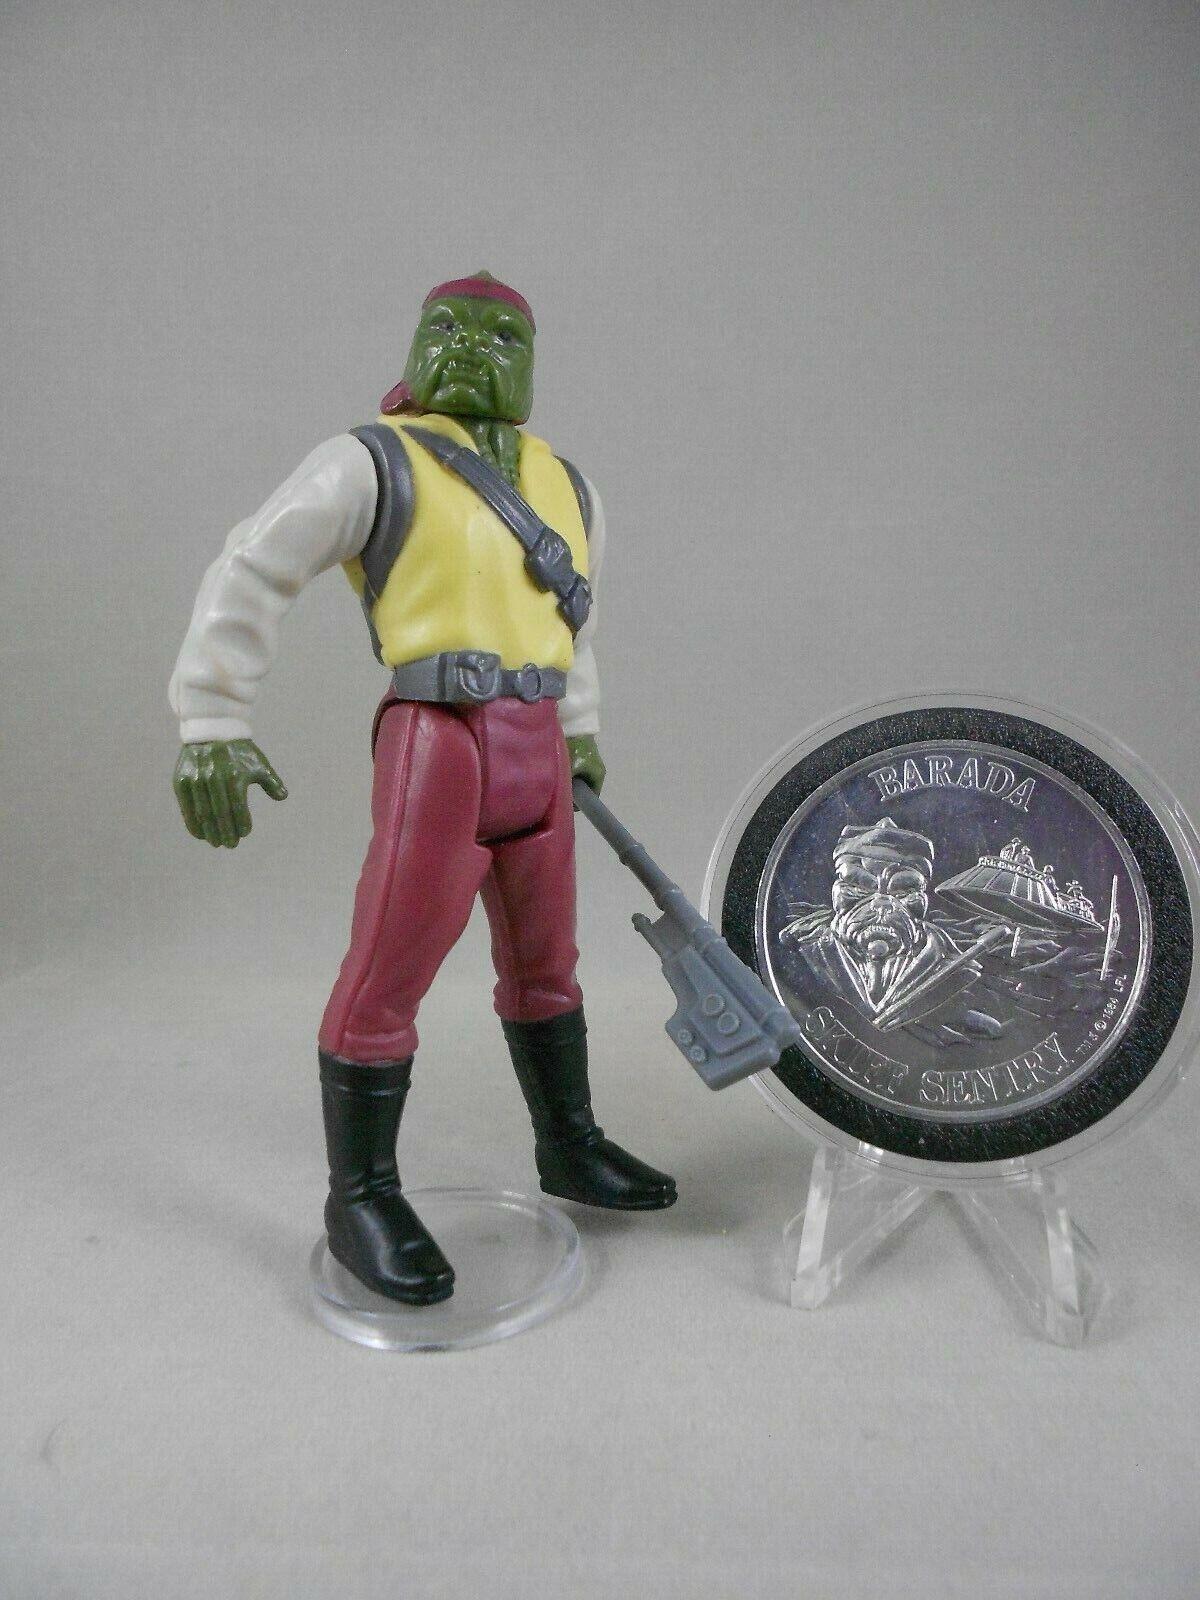 Retro Estrella Wars Potf 1985 Barada-E N Menta  Vintage  completa con Potf Moneda